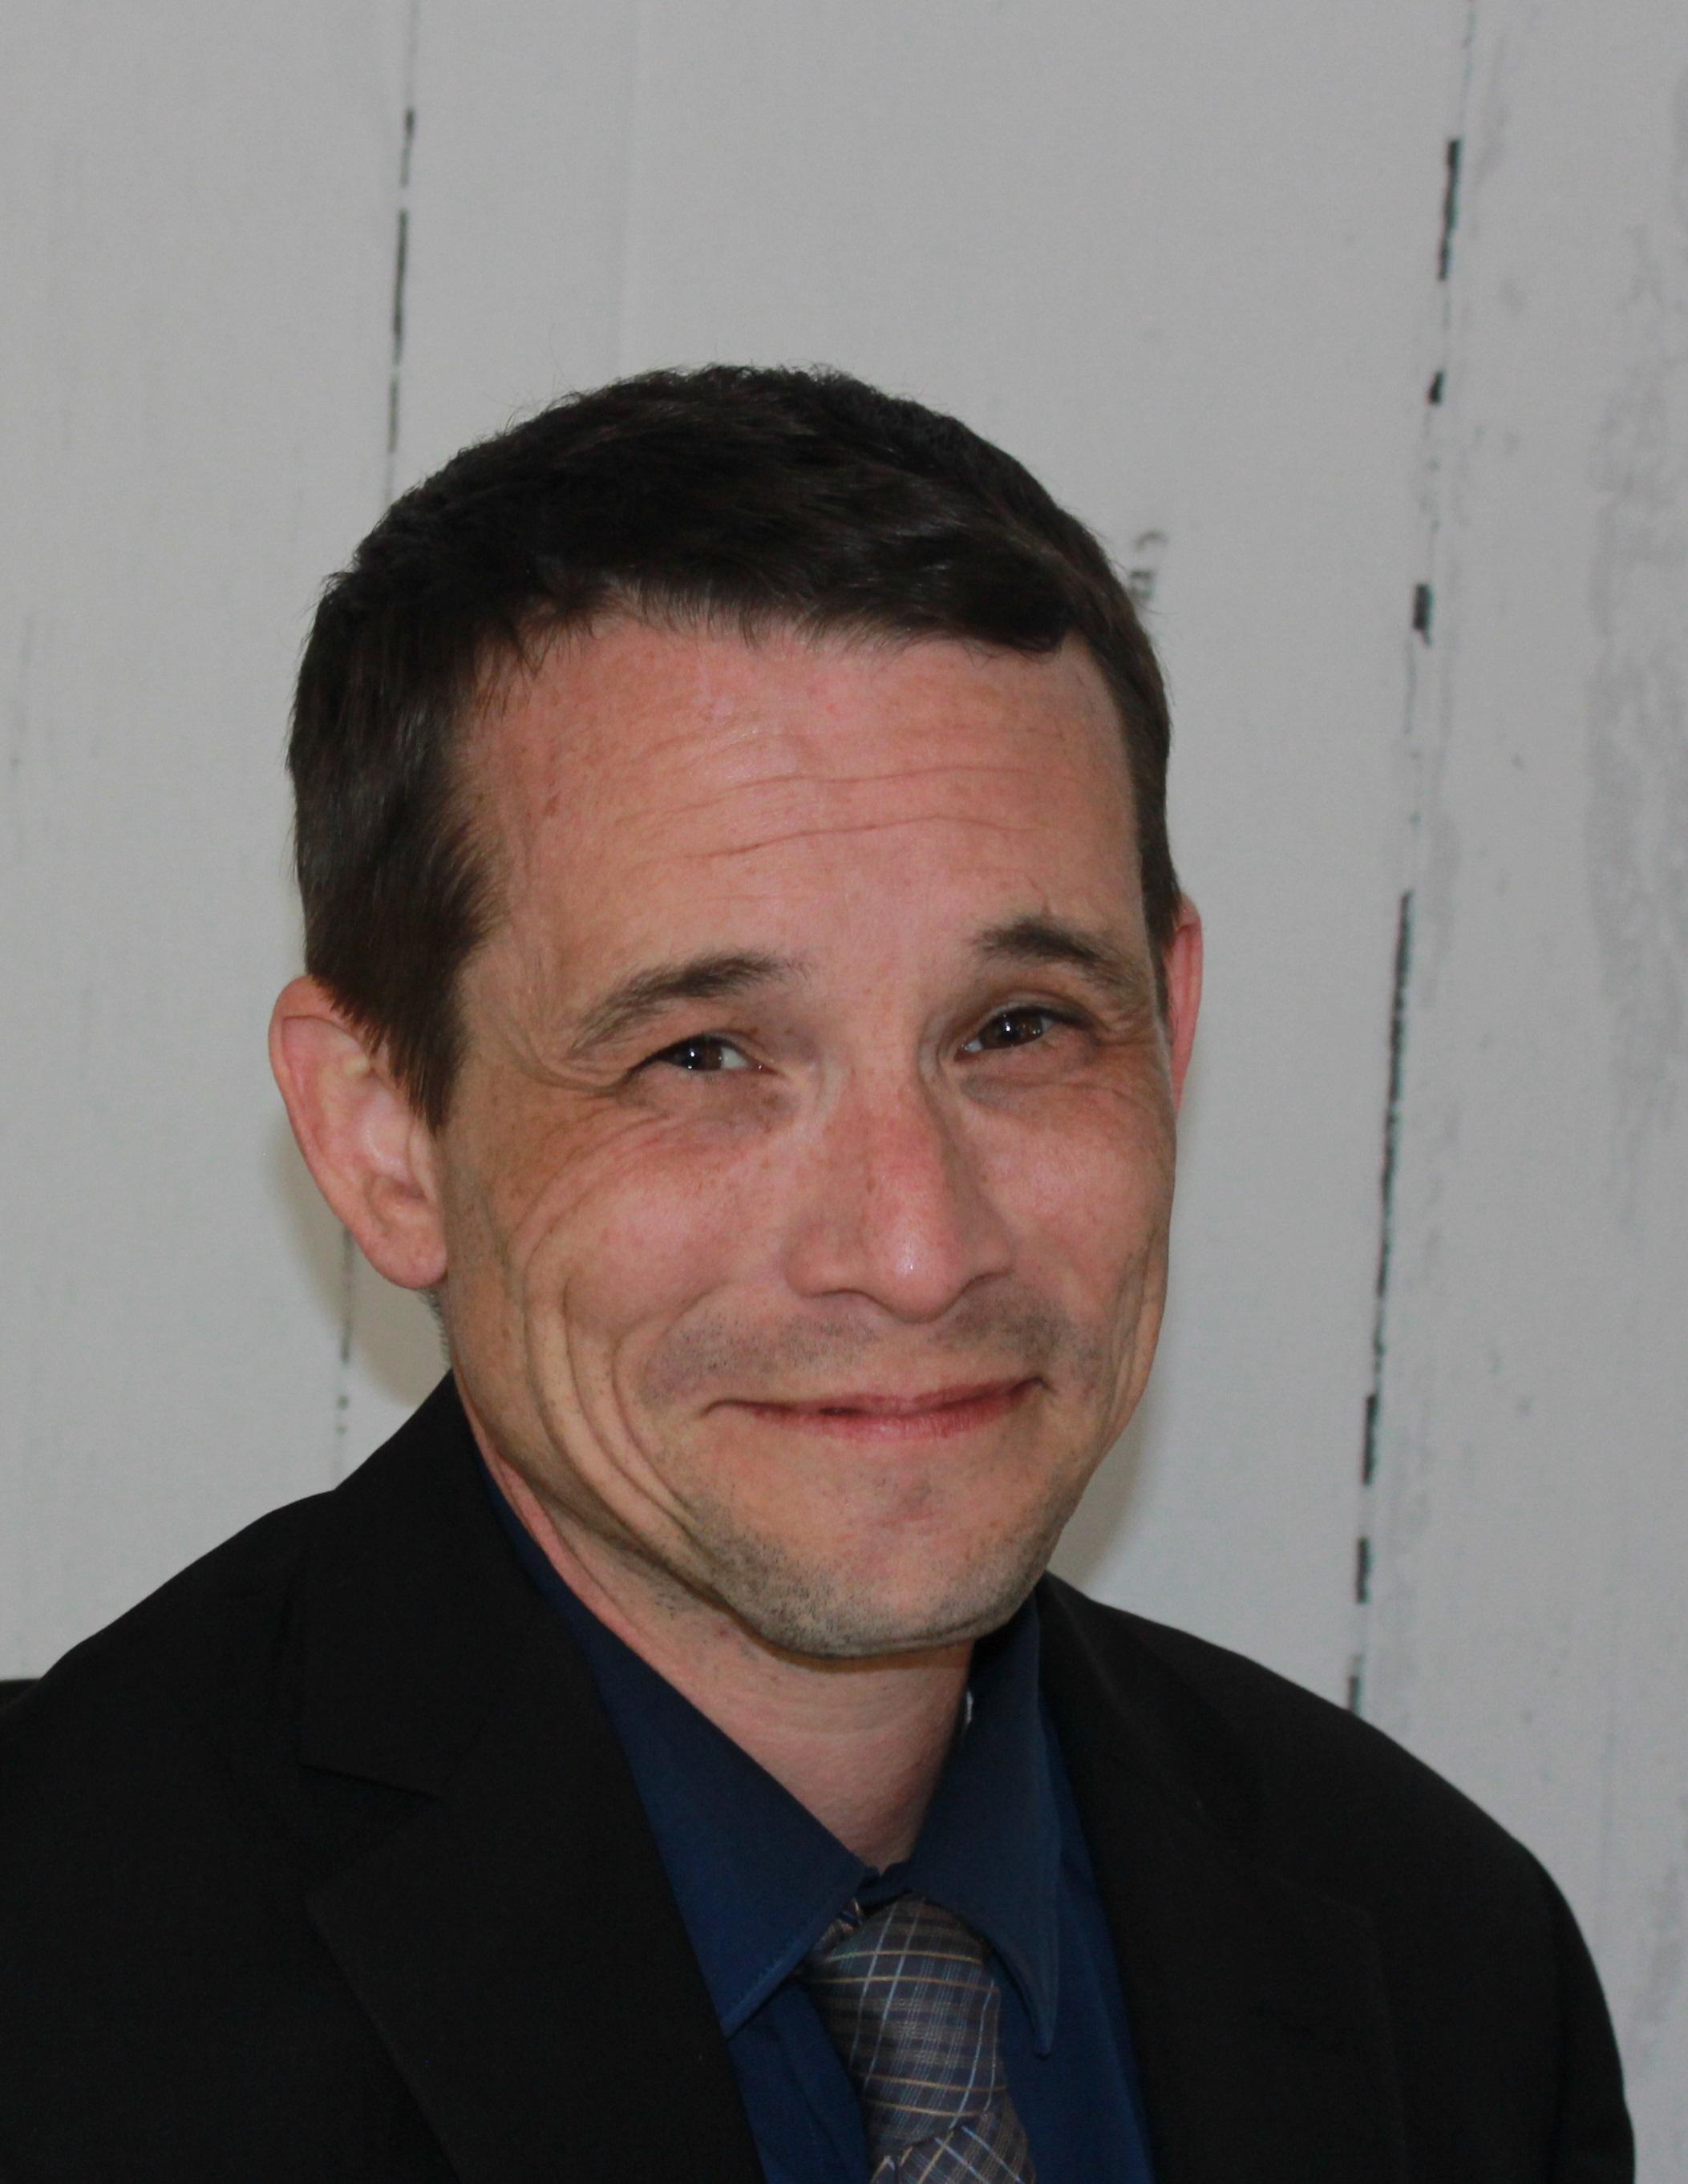 Nicholas Dibble